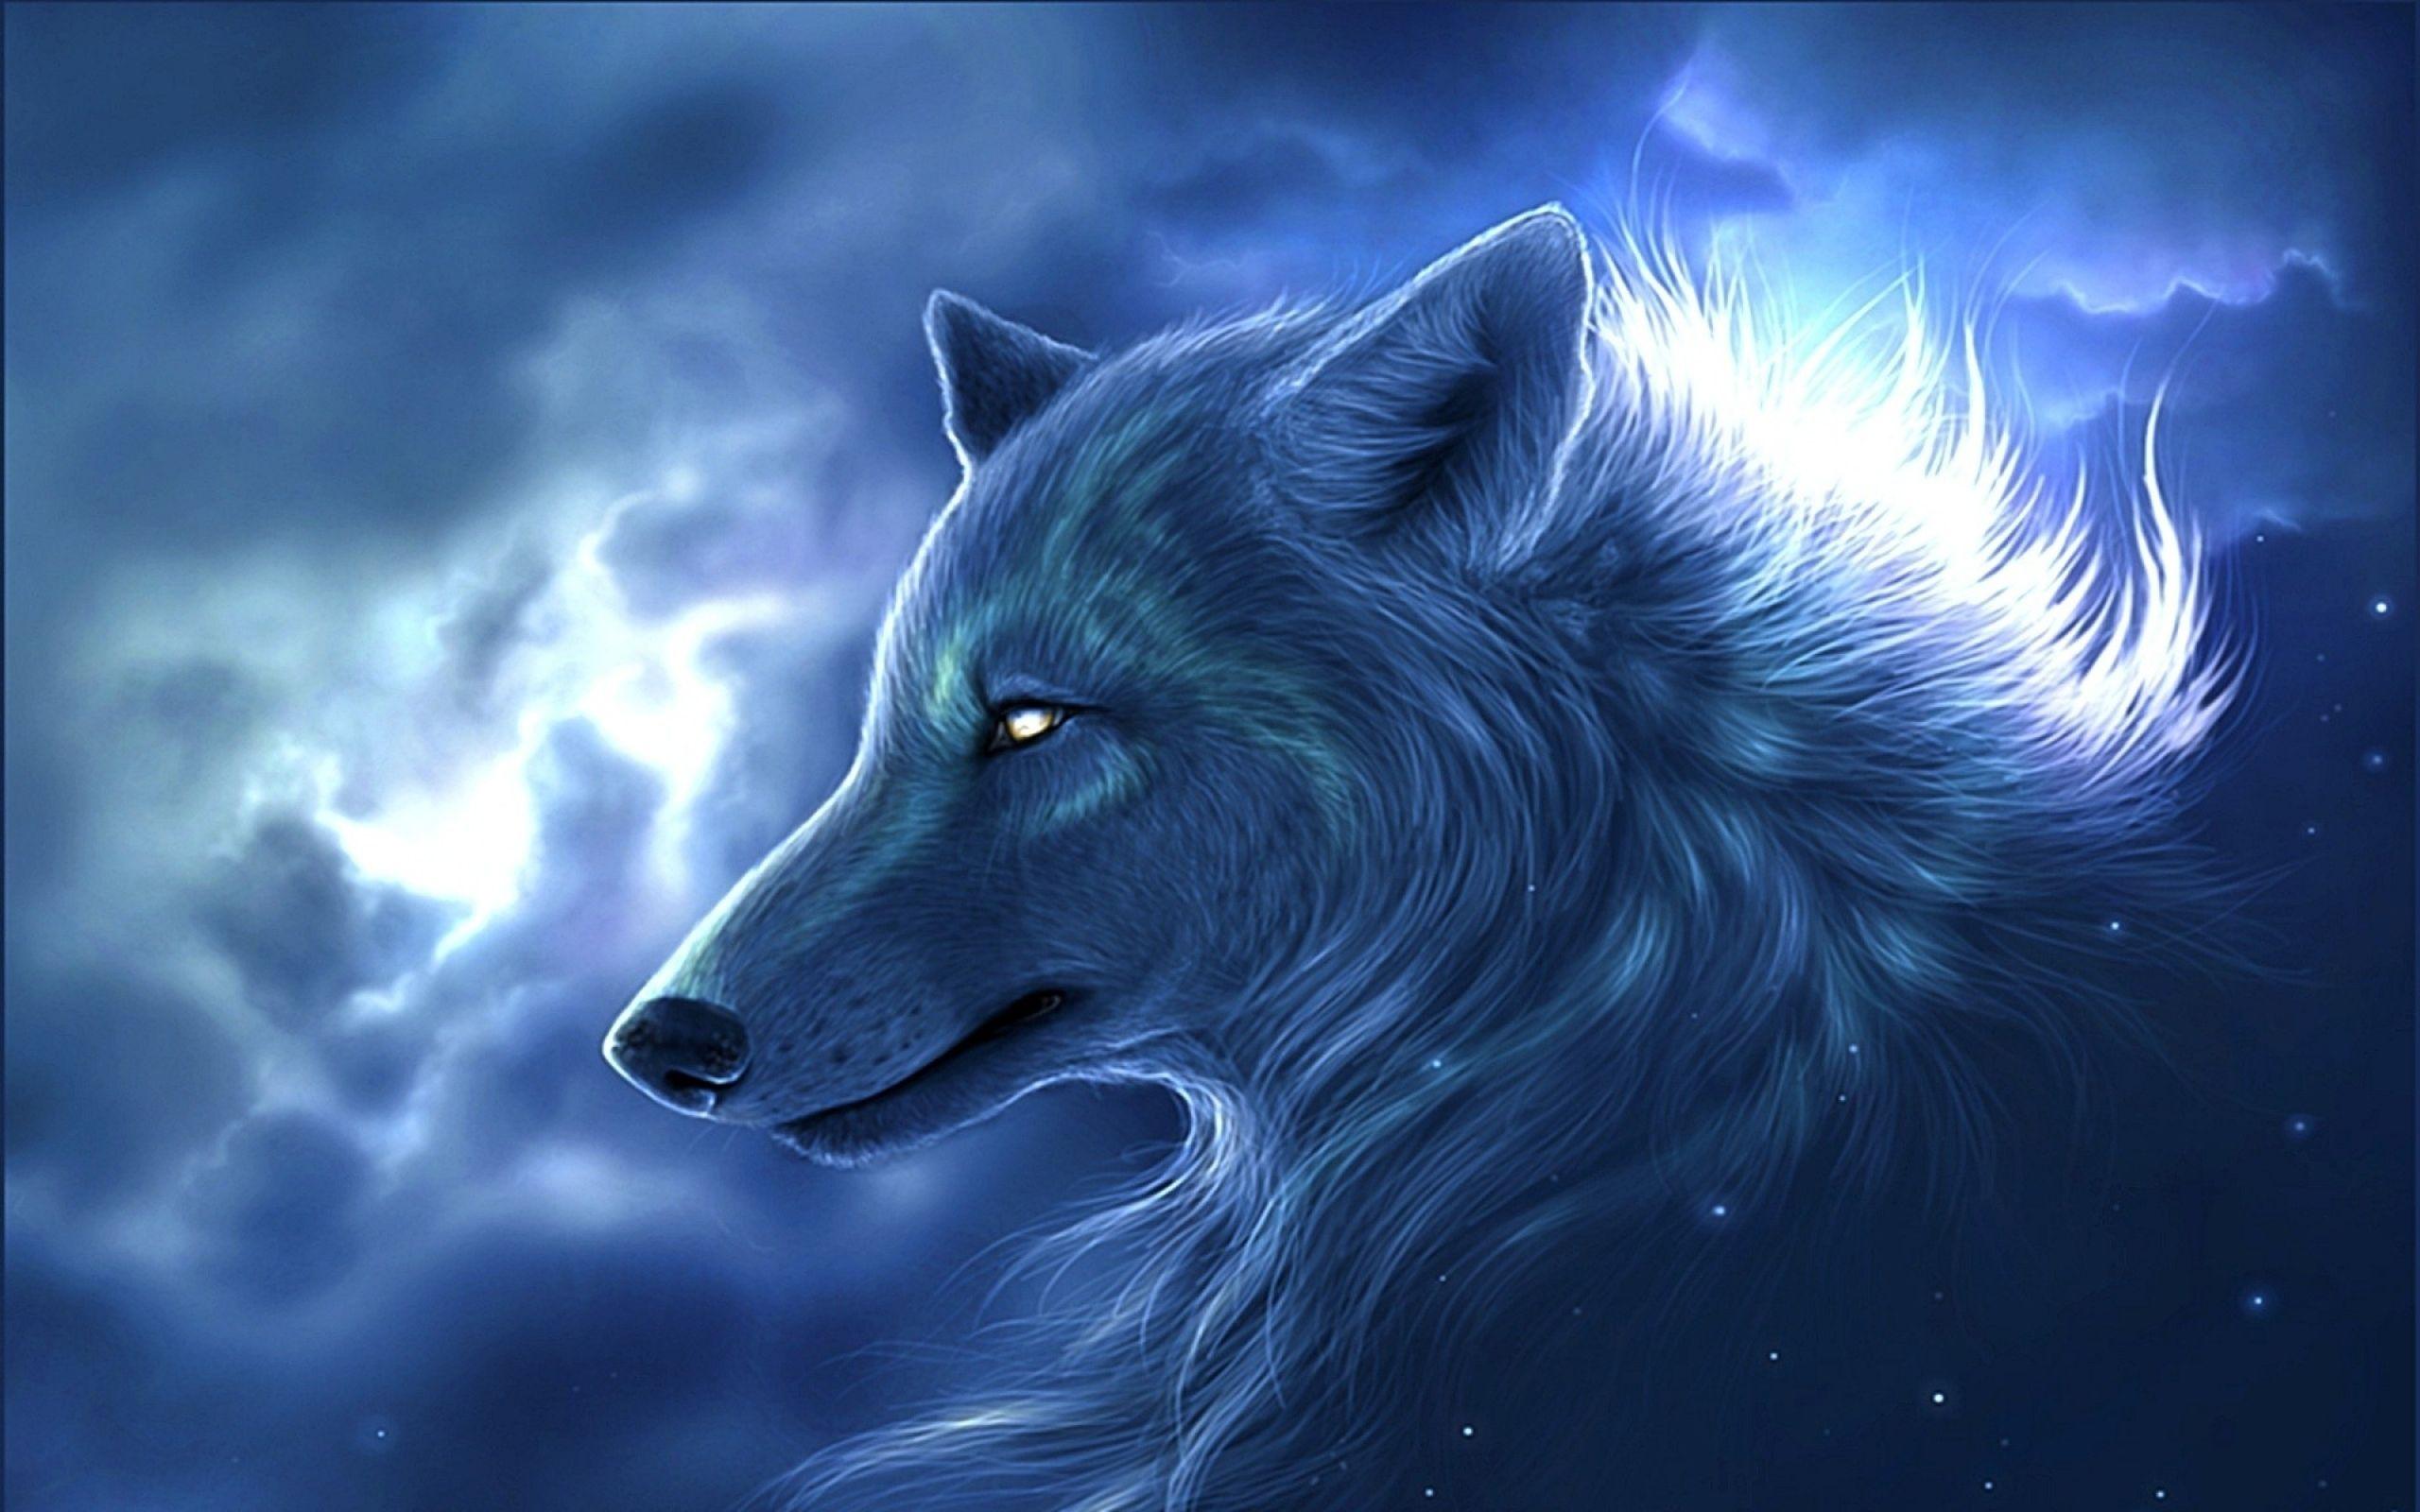 10 Latest Fantasy Wolf Wallpaper Hd Full Hd 1920 1080 For Pc Desktop Wolf Wallpaper Fantasy Wolf Wolf Poster